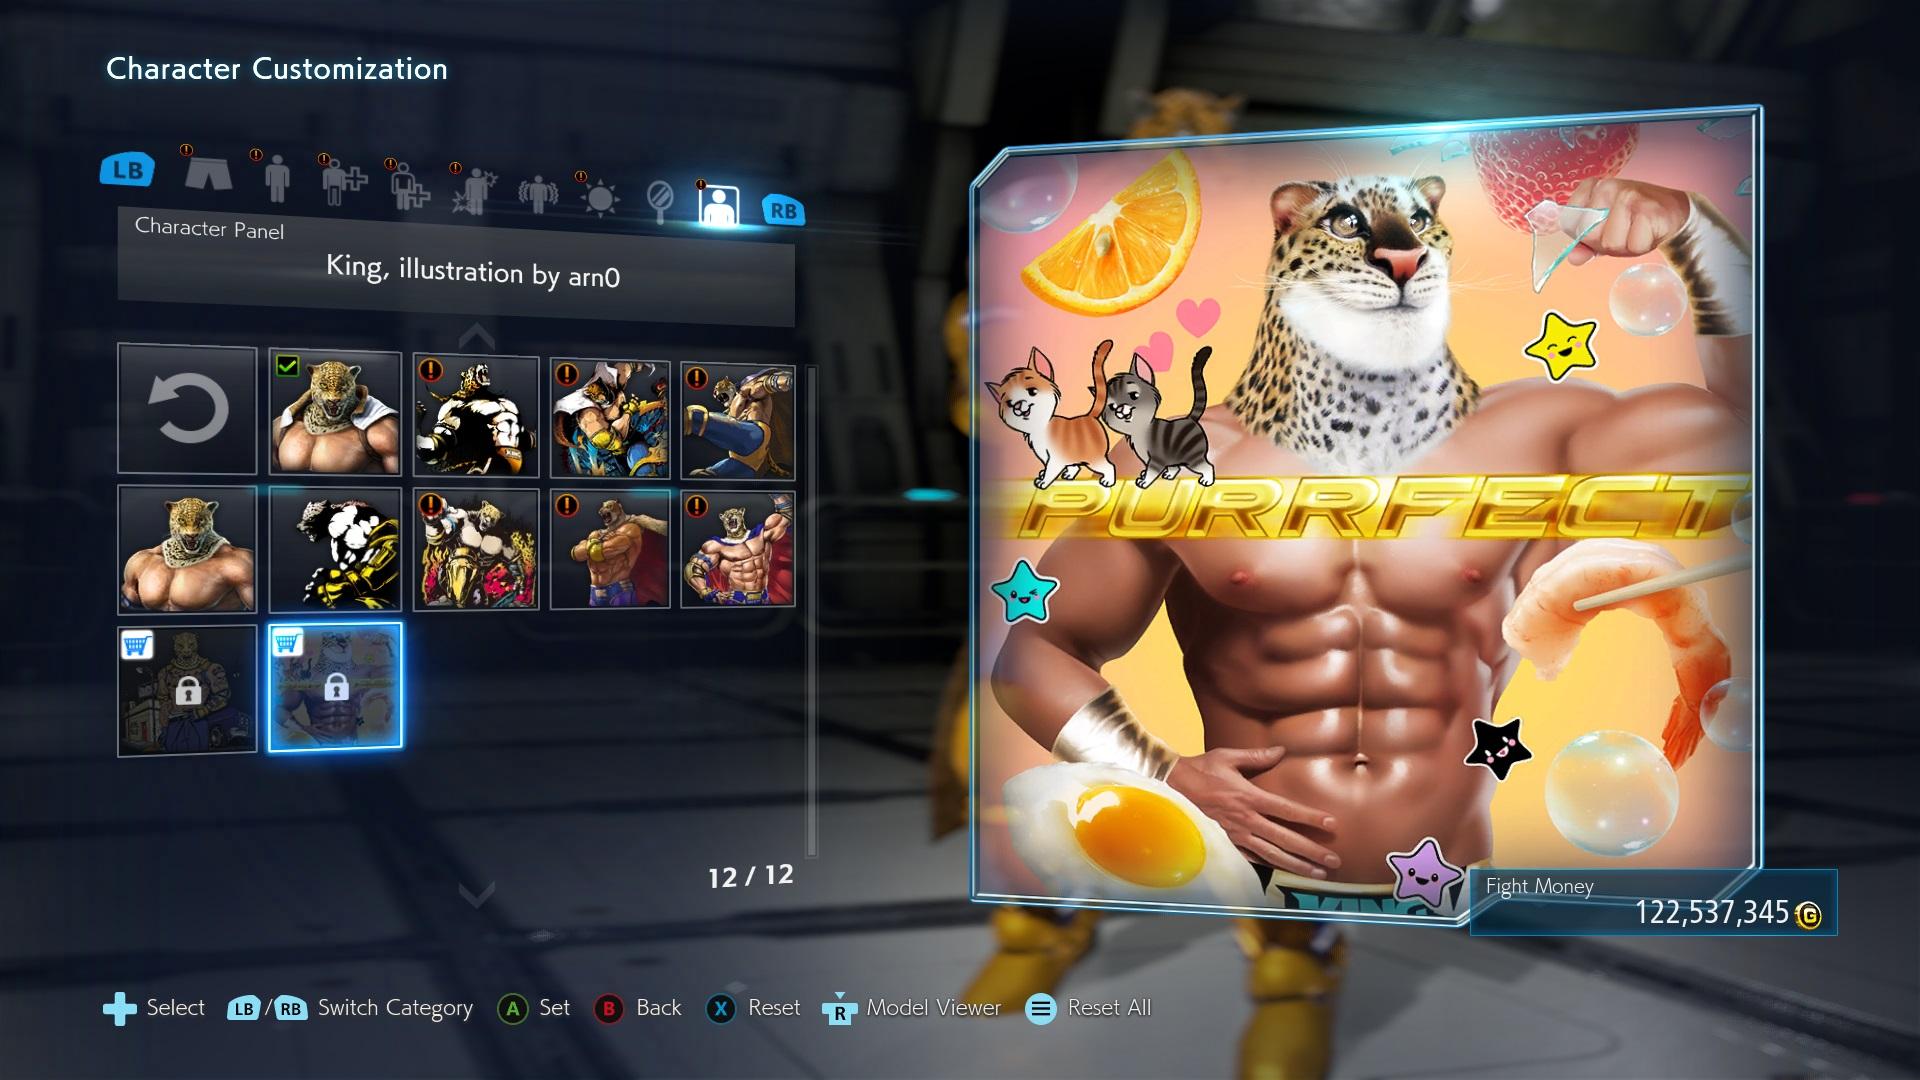 Tekken 7 Version 1 07 Update Includes Balance Changes & New